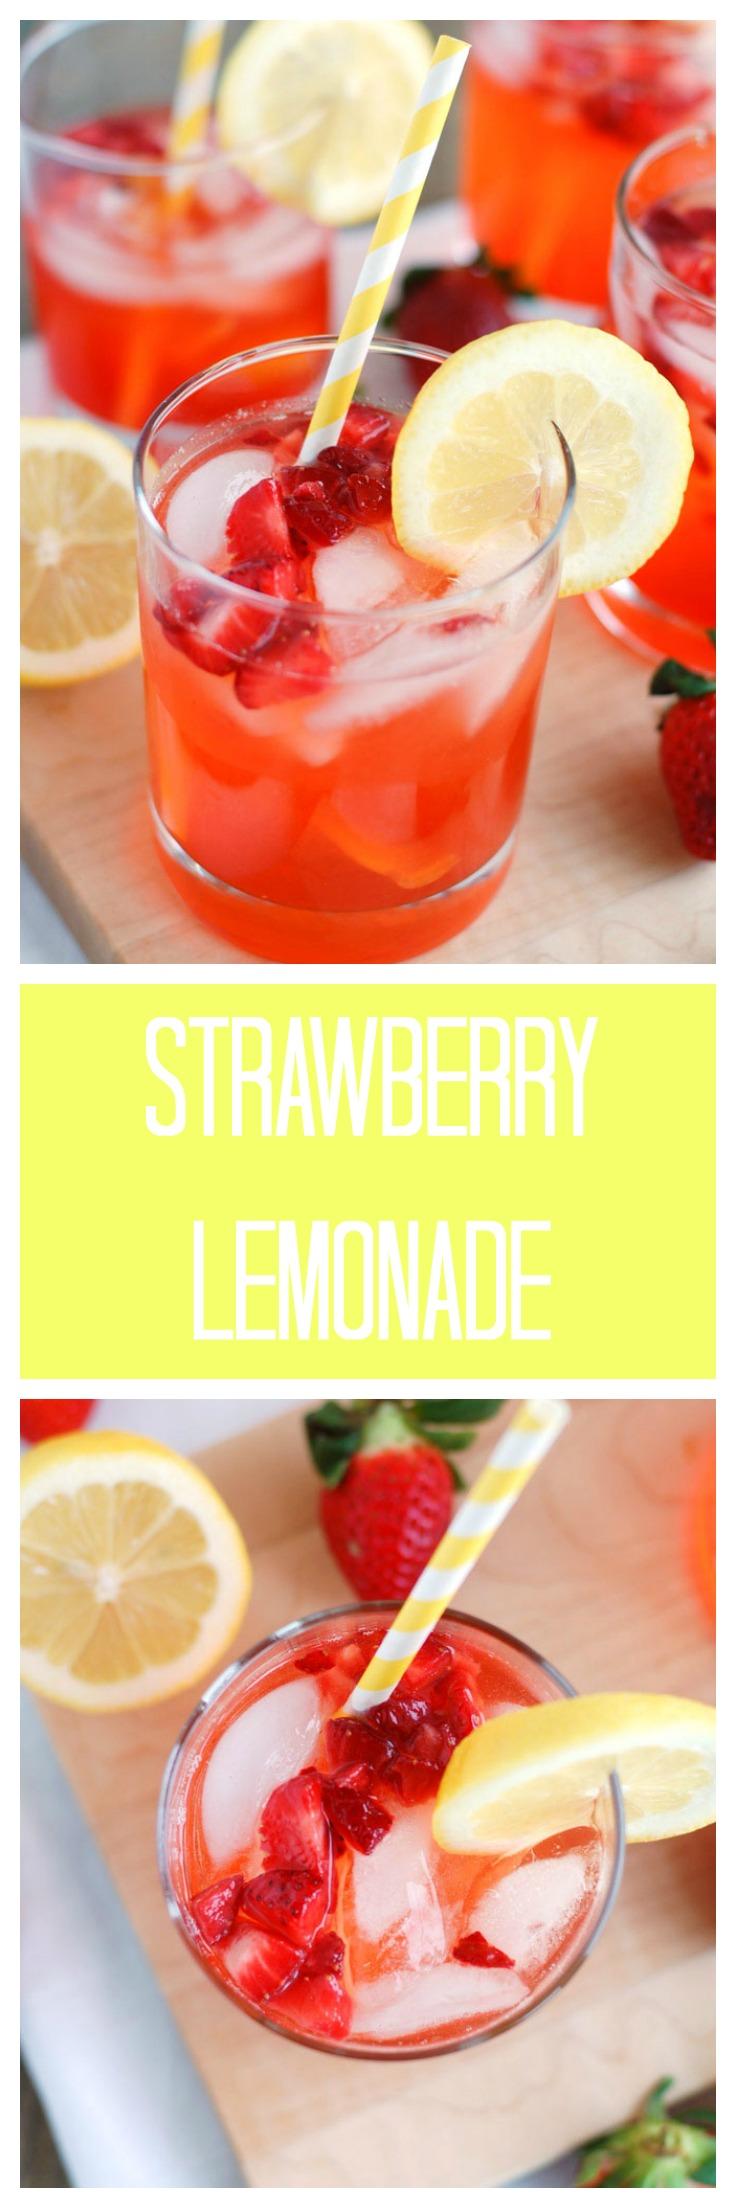 Strawberry Lemonade - Easy strawberry lemonade. Great for a party or brunch. #strawberrylemonade #lemonade #drink #strawberry #brunch #party